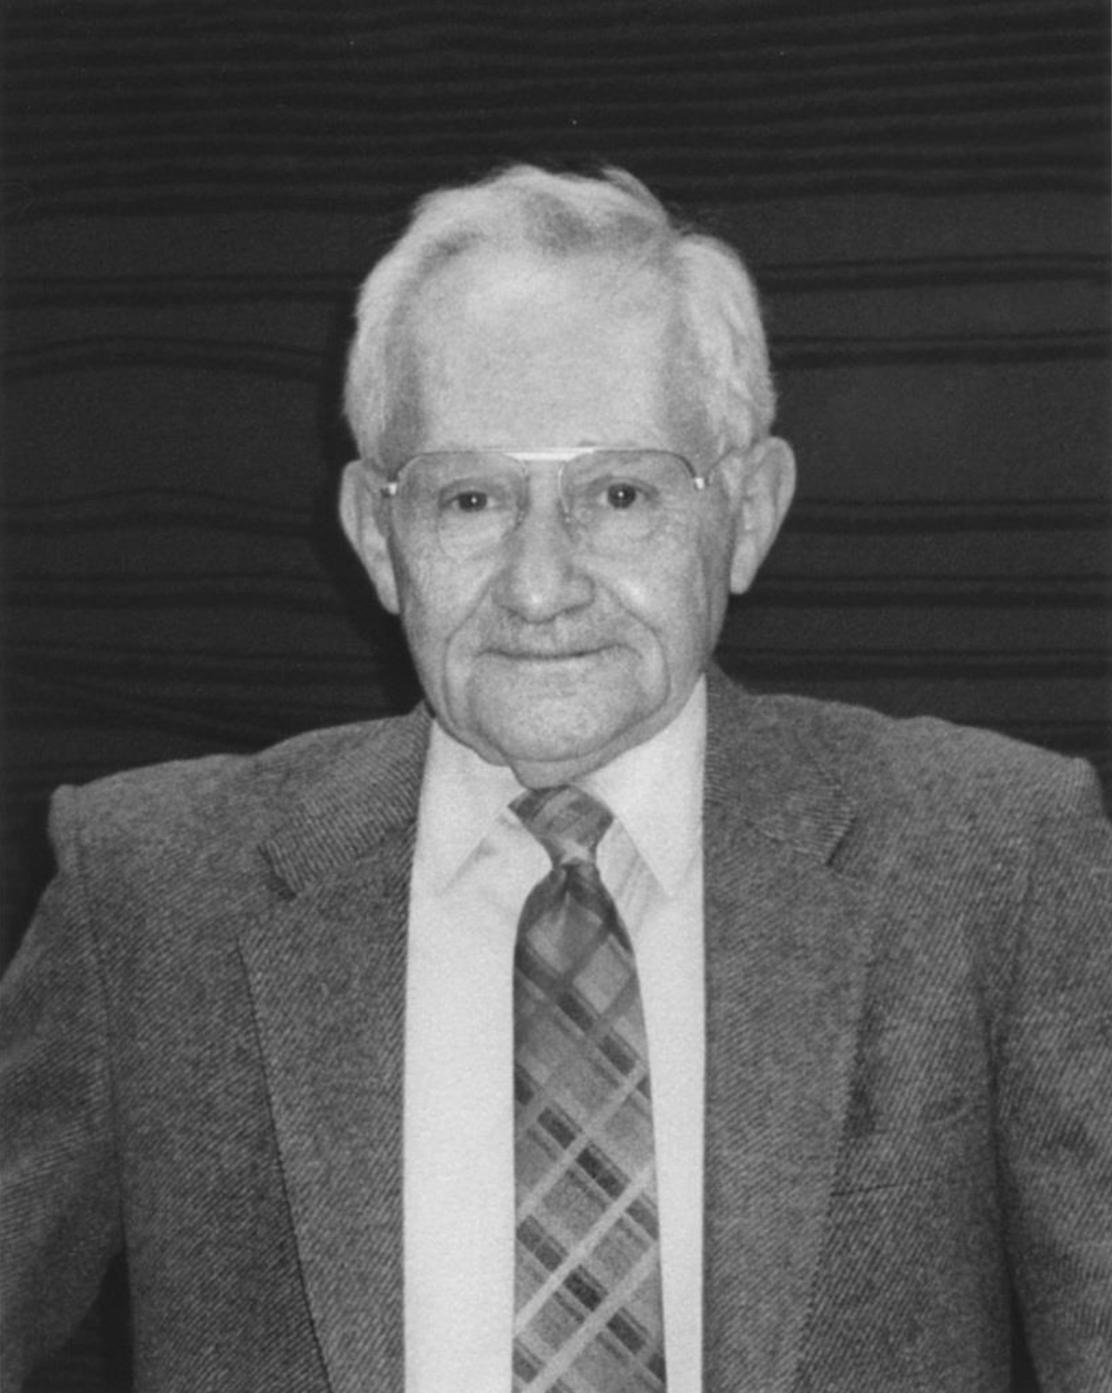 MACK E. BROWN